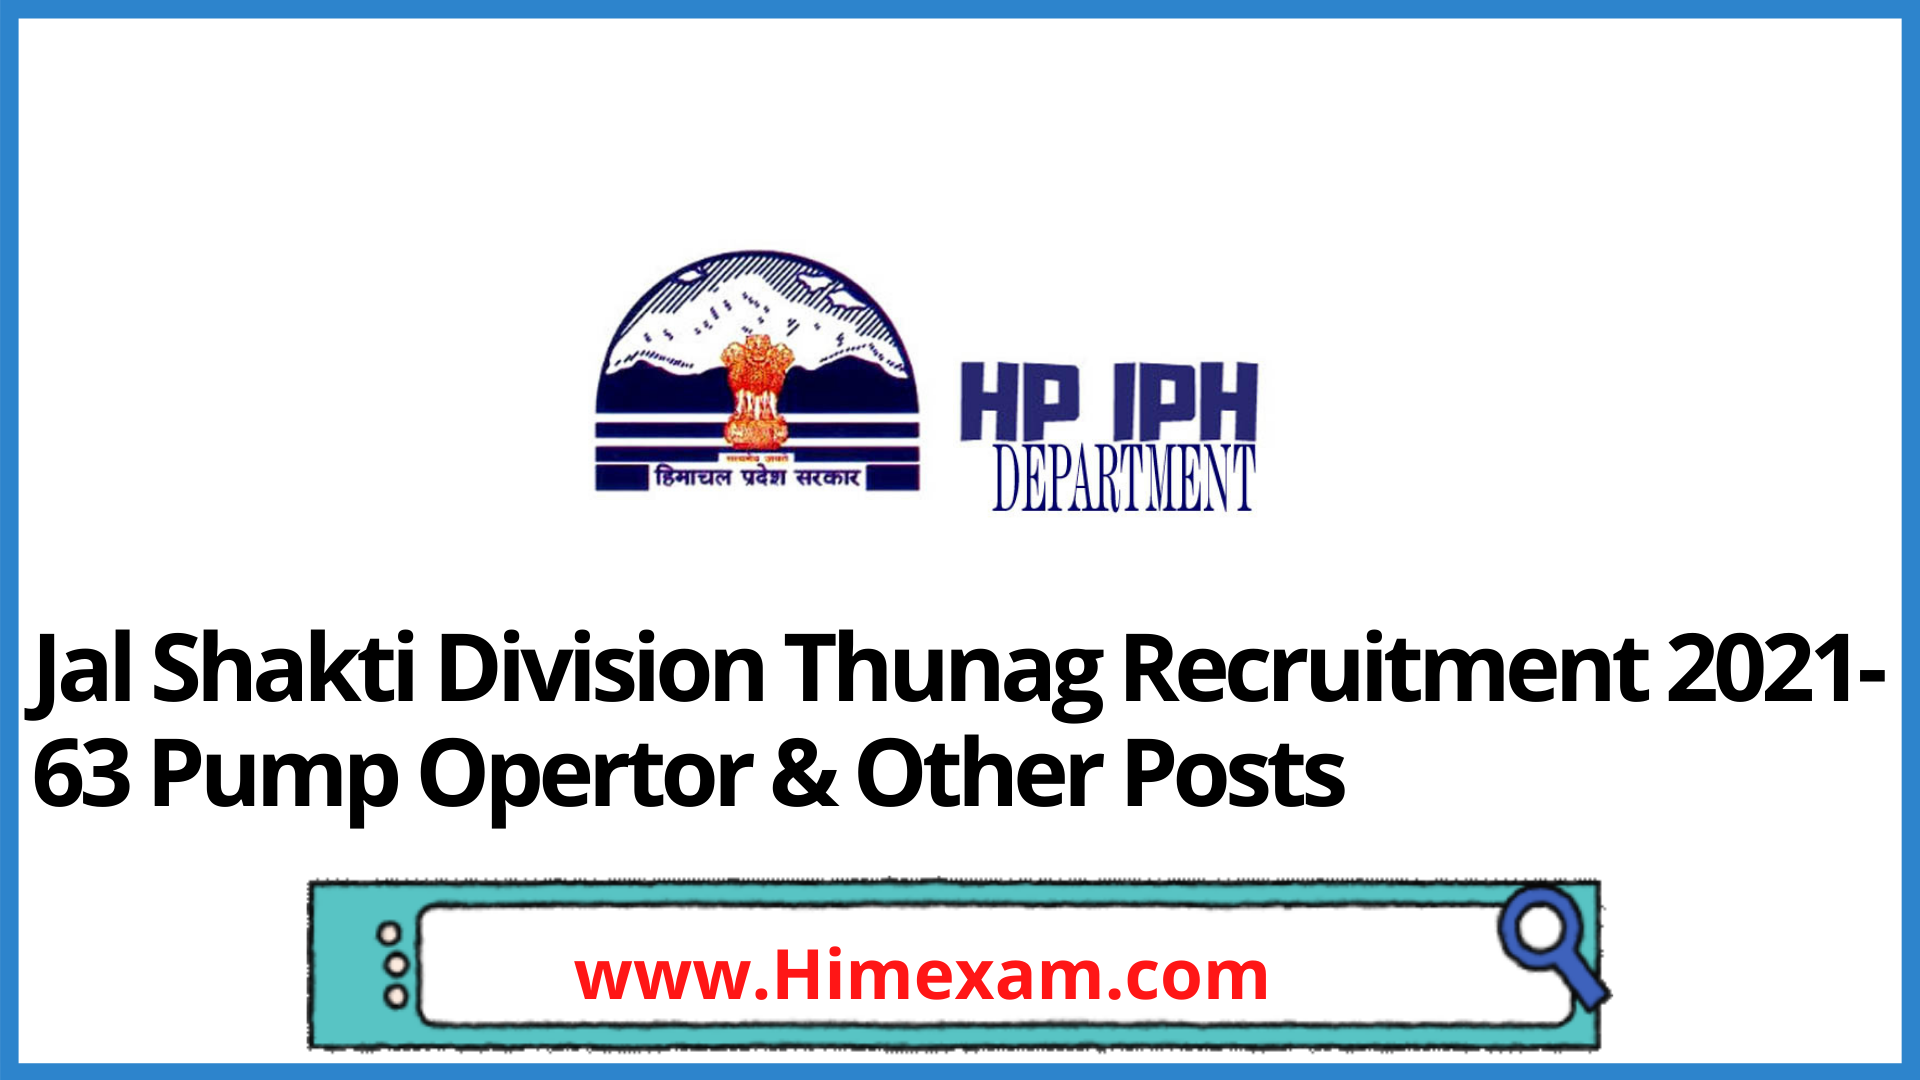 Jal Shakti Division Thunag  Recruitment 2021-63 Pump Opertor & Other Posts